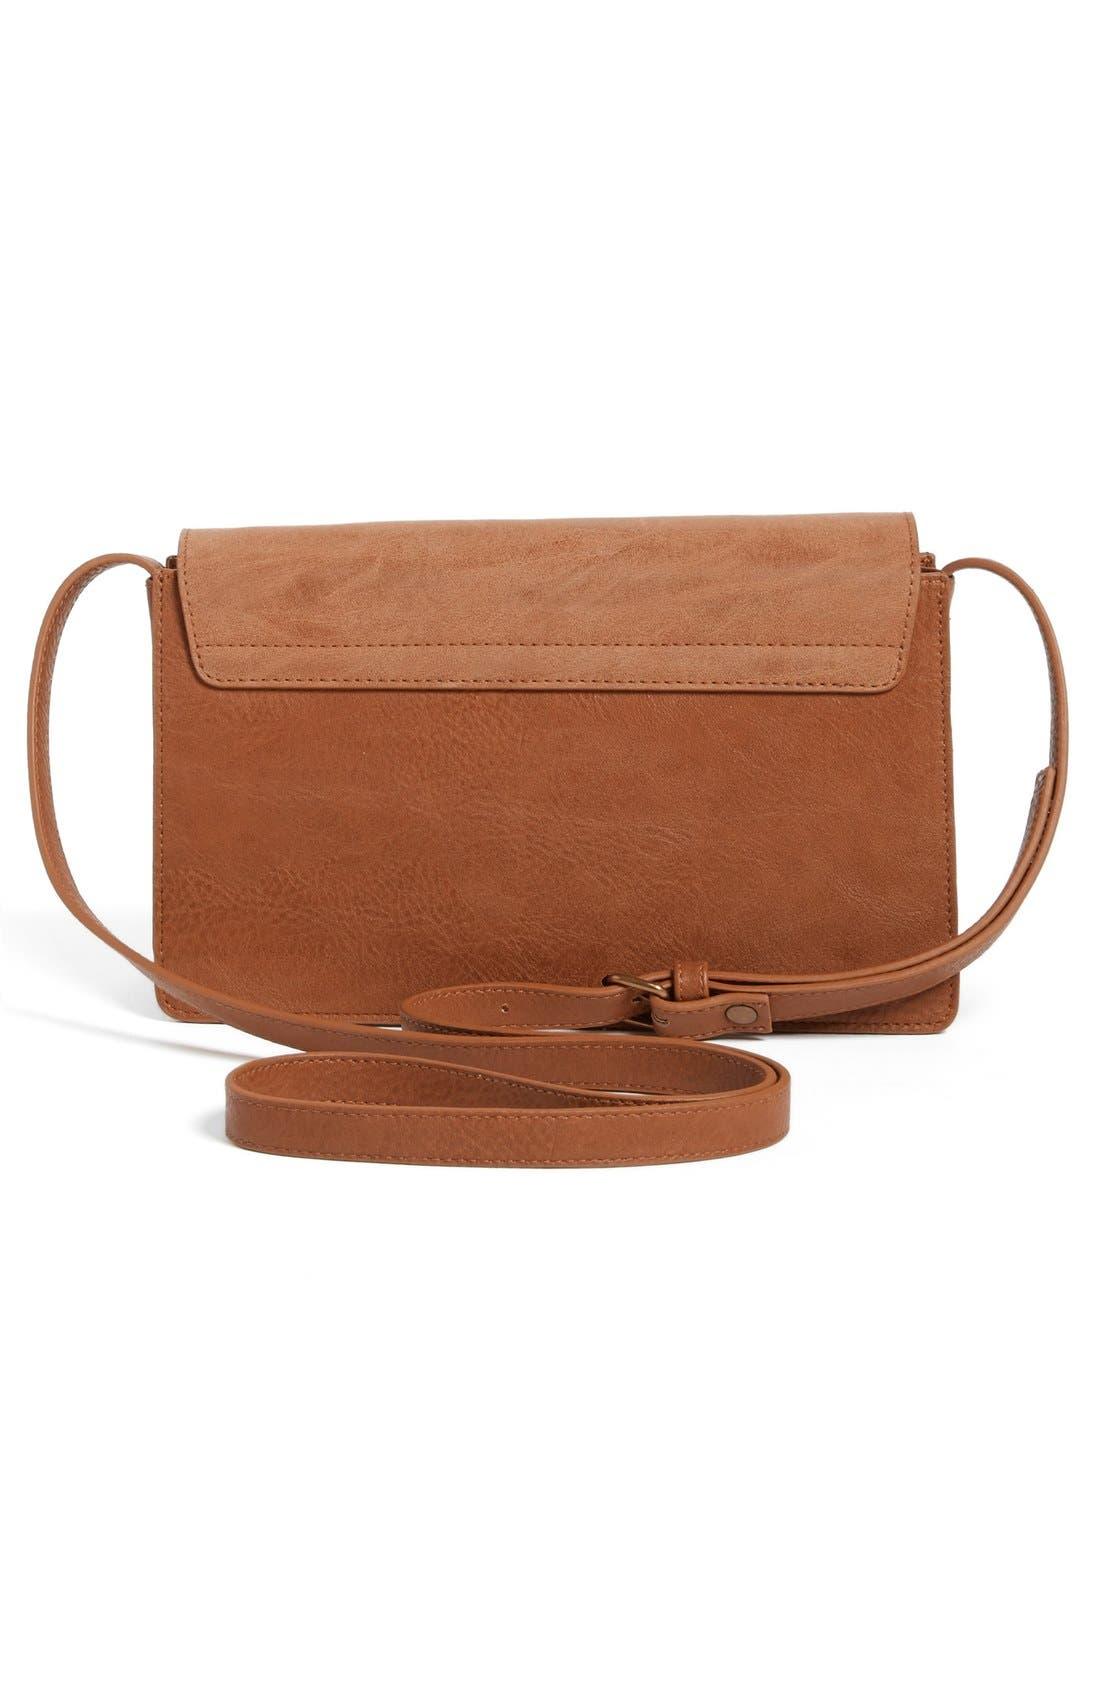 Alternate Image 3  - BP. Tassel Faux Leather Crossbody Bag